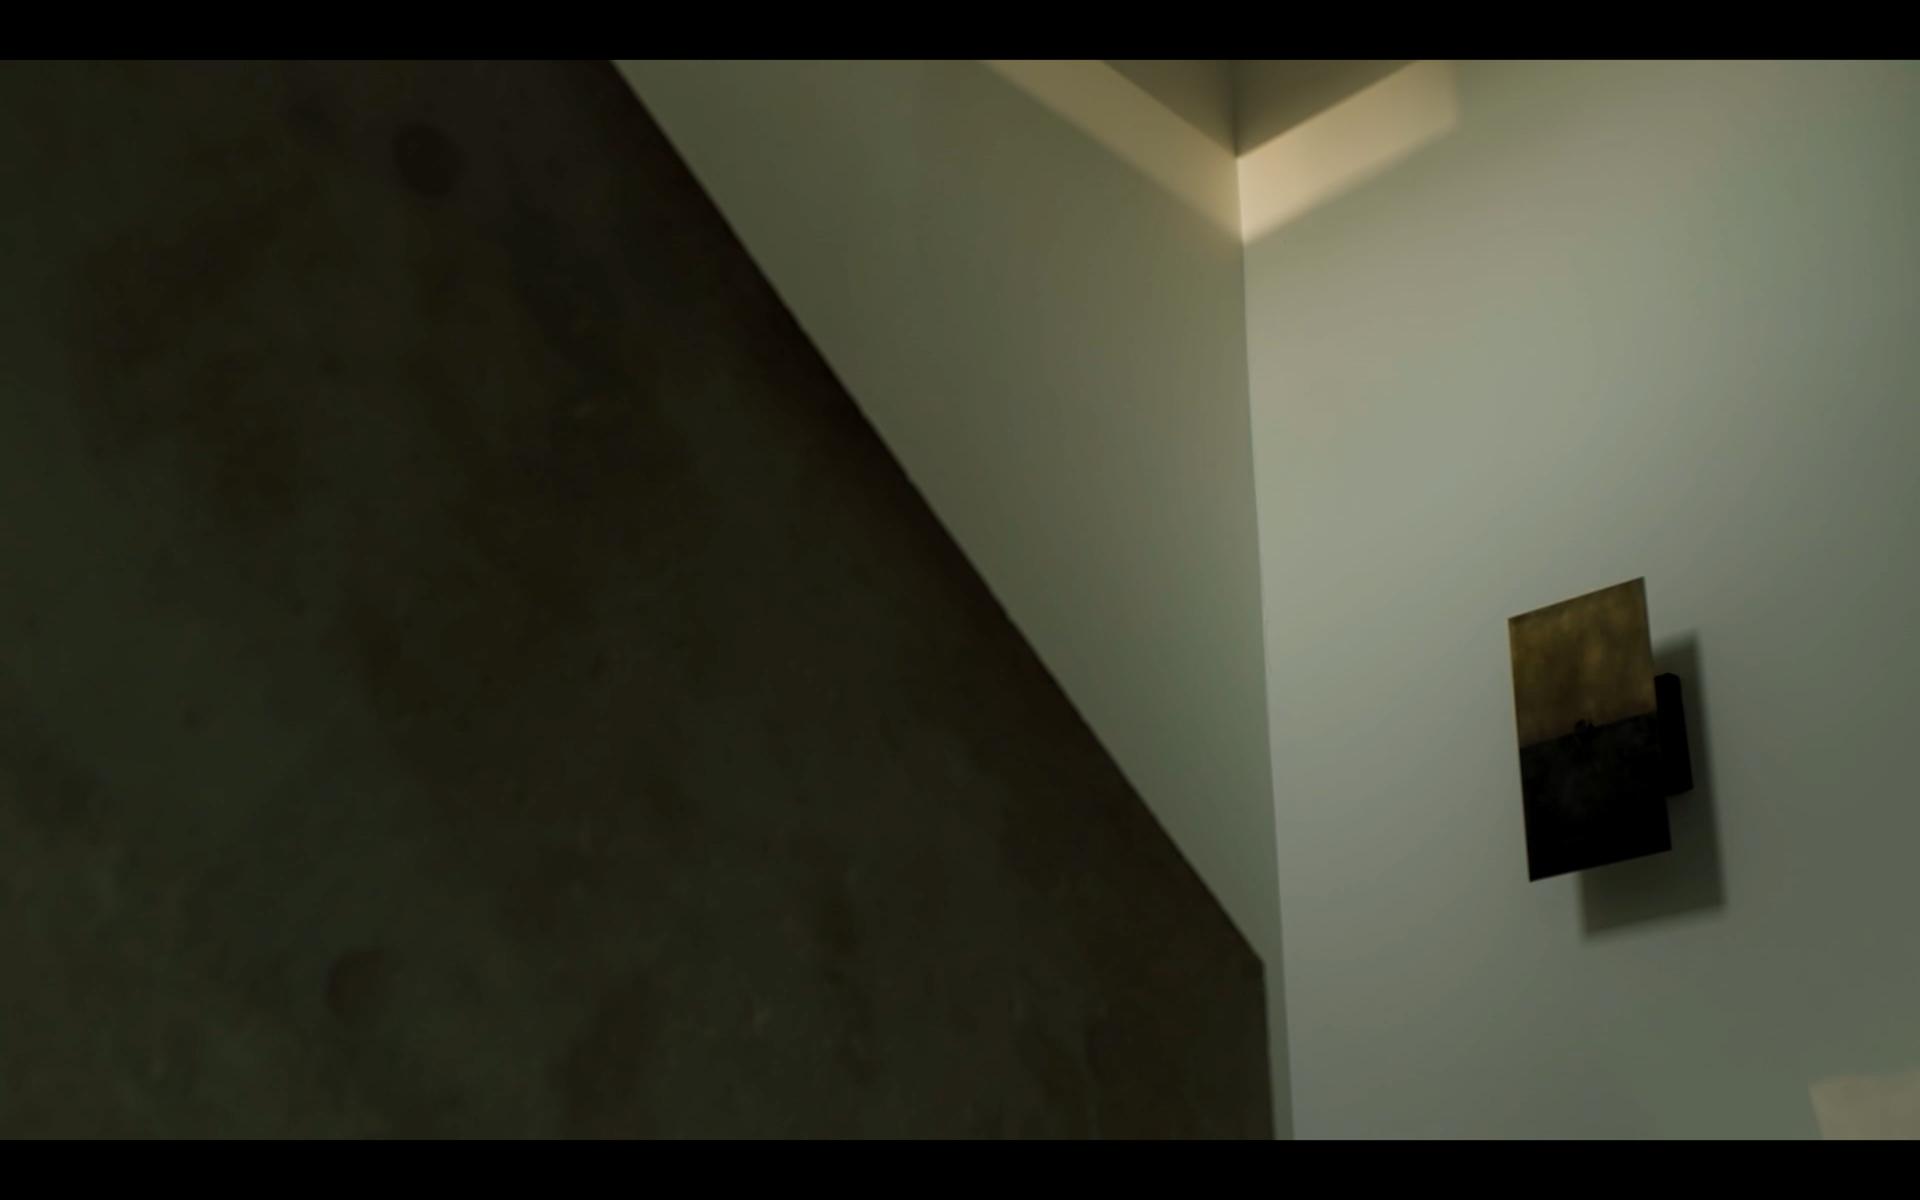 KYLE MACFADZEAN - Screenshot 2021-04-26 at 00.32.32